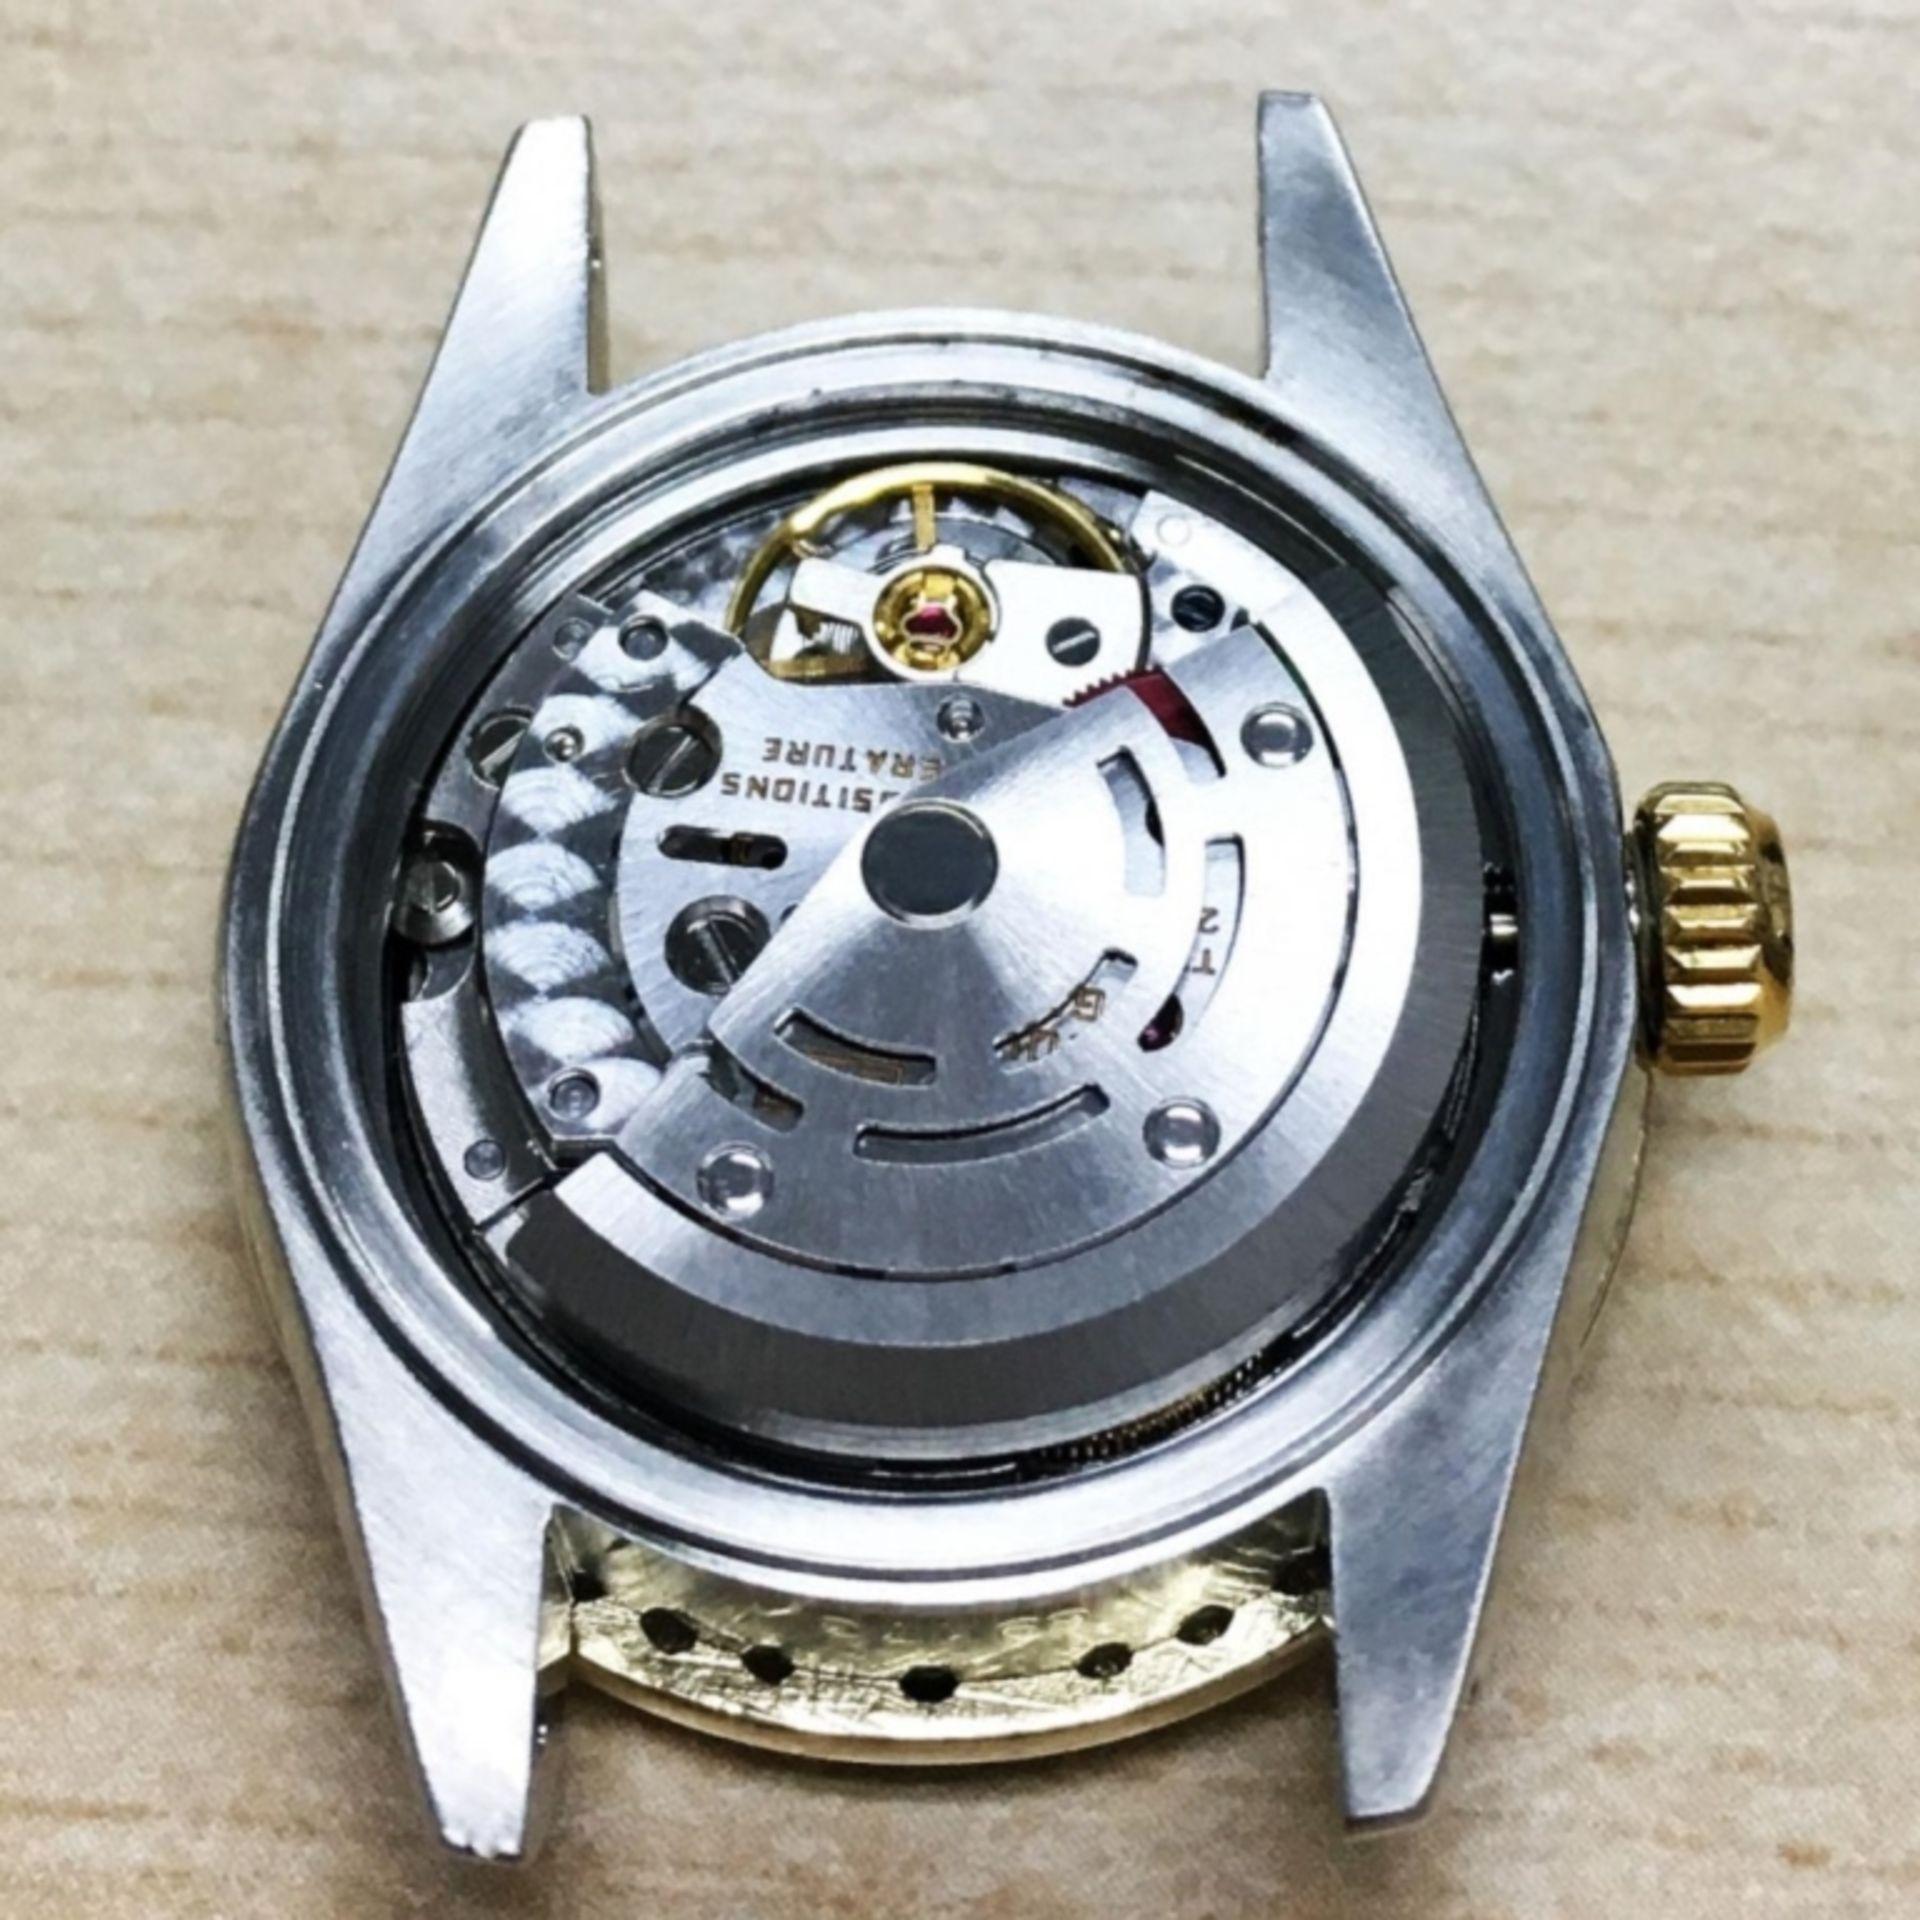 Rolex DateJust 18K & SS 1.00ct Diamond Blue Vignet - Image 4 of 8